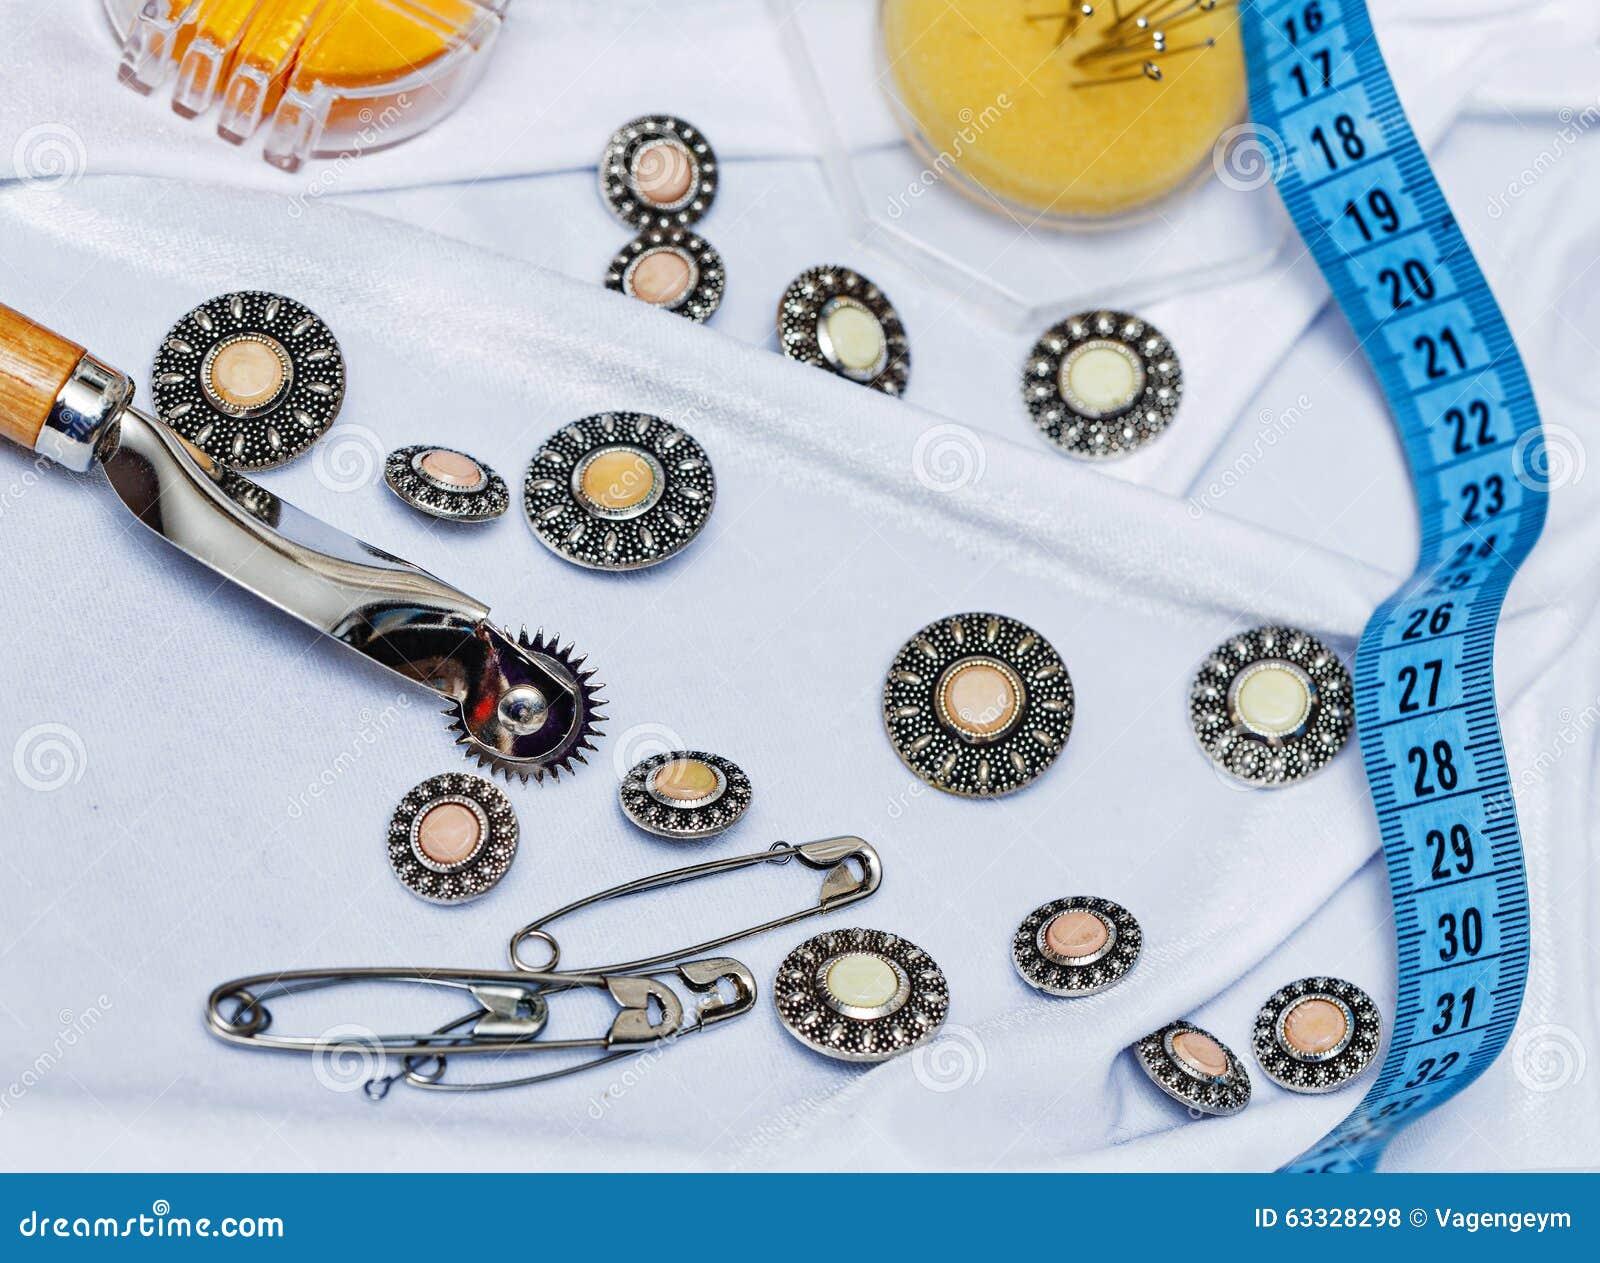 5f8050cb1cd4 Κουμπιά, καρφίτσες, που μετρούν την ταινία και μια βελόνα που βρίσκεται στο  ύφασμα μεταξιού Η έννοια της ραπτικής Σχέδιο μόδας Σπίτια μόδας Στοιχεία  για το ...